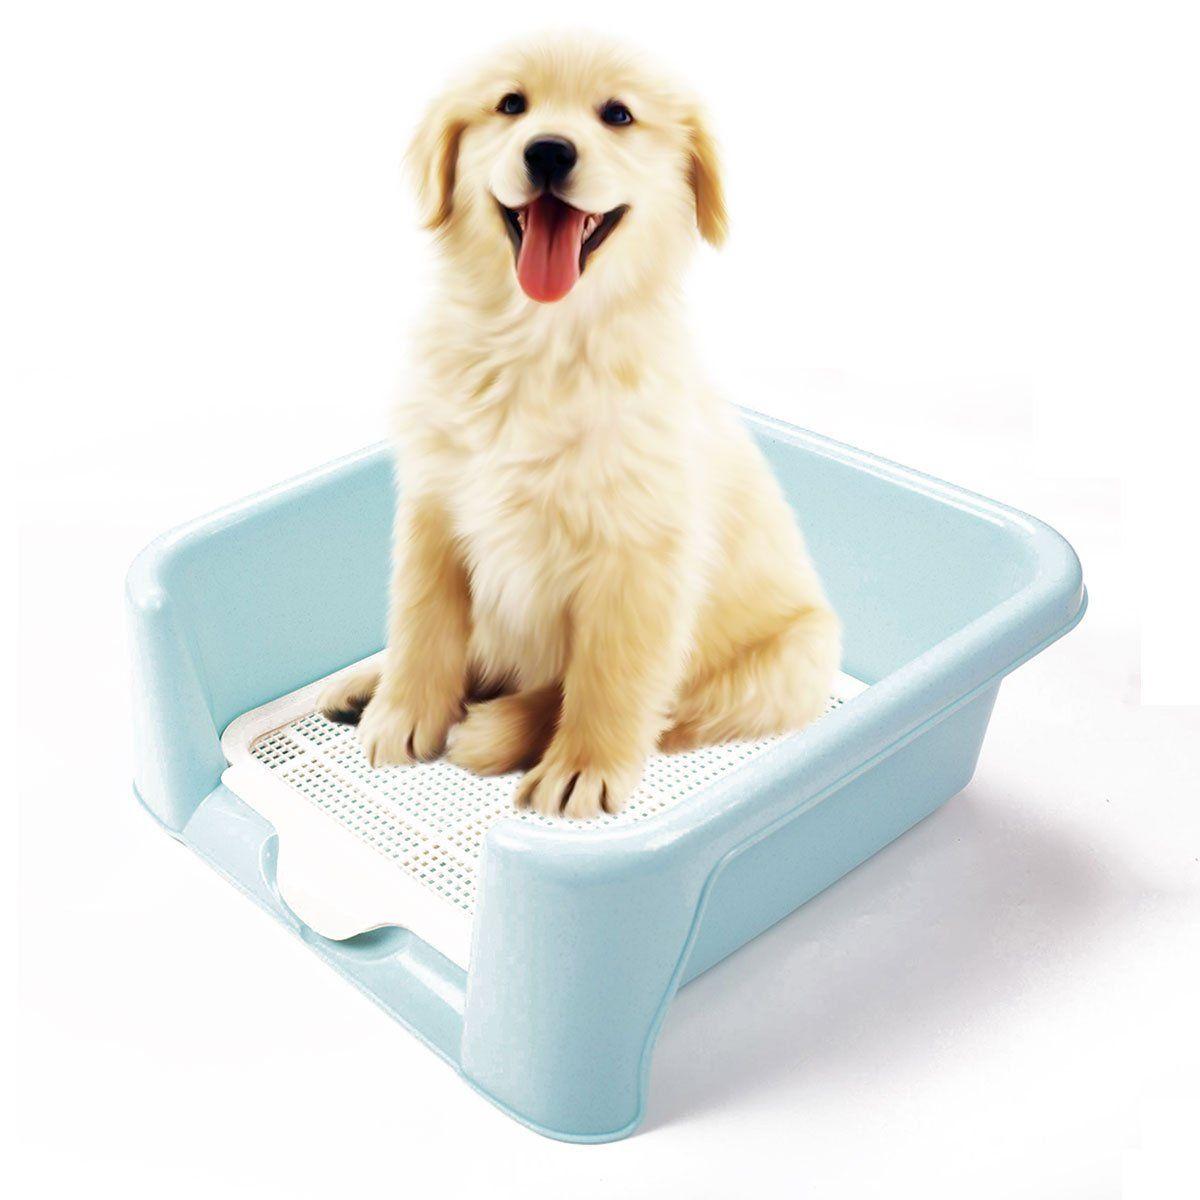 Amazon.com : Dog Toilet, FATPET Portable Plastic Toilet for Puppy ...